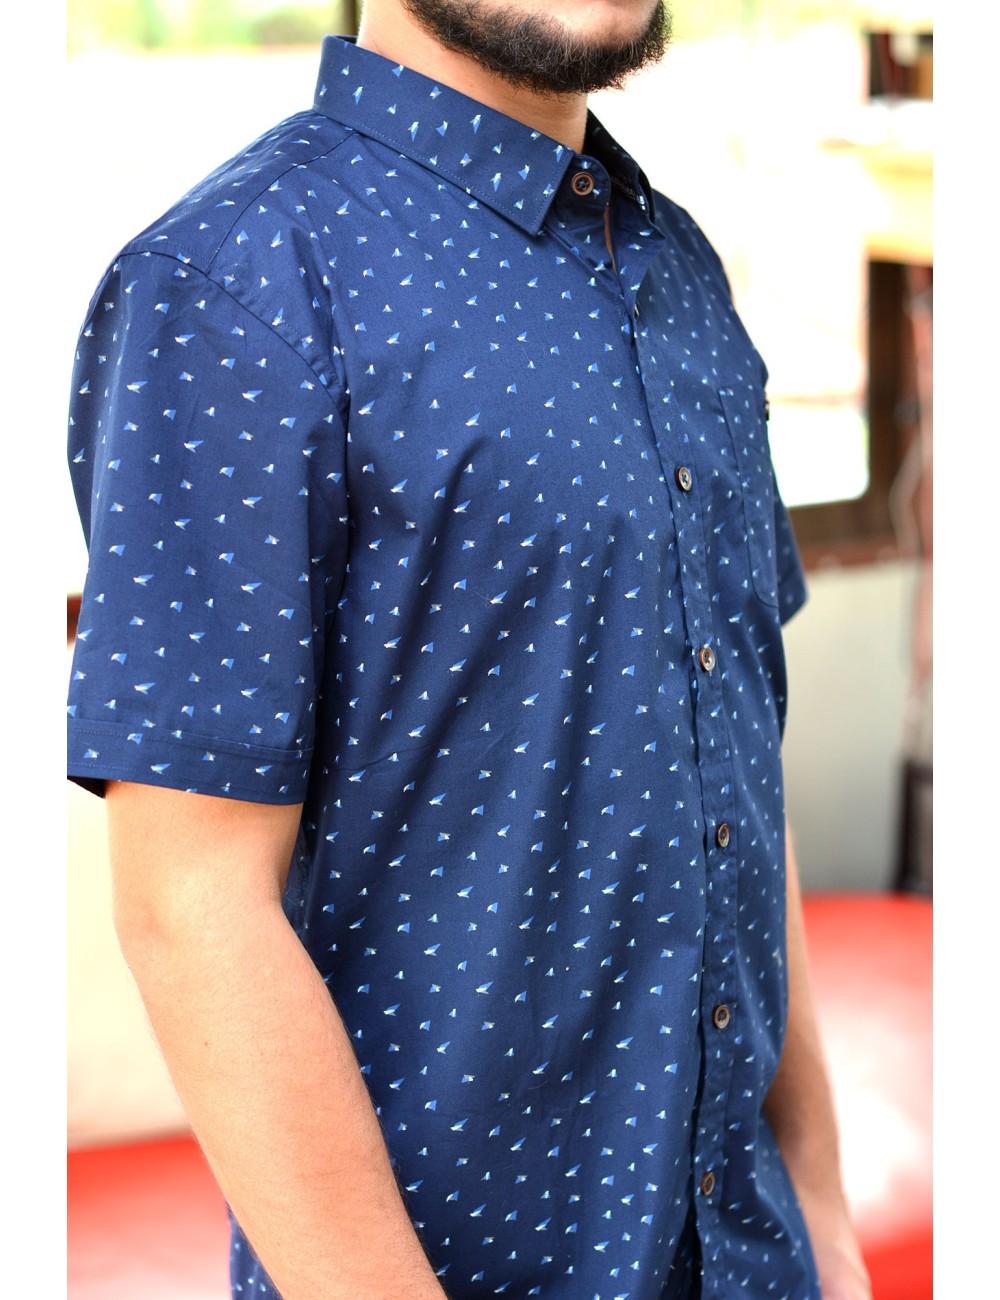 Camisa azul manga corta estampado celeste